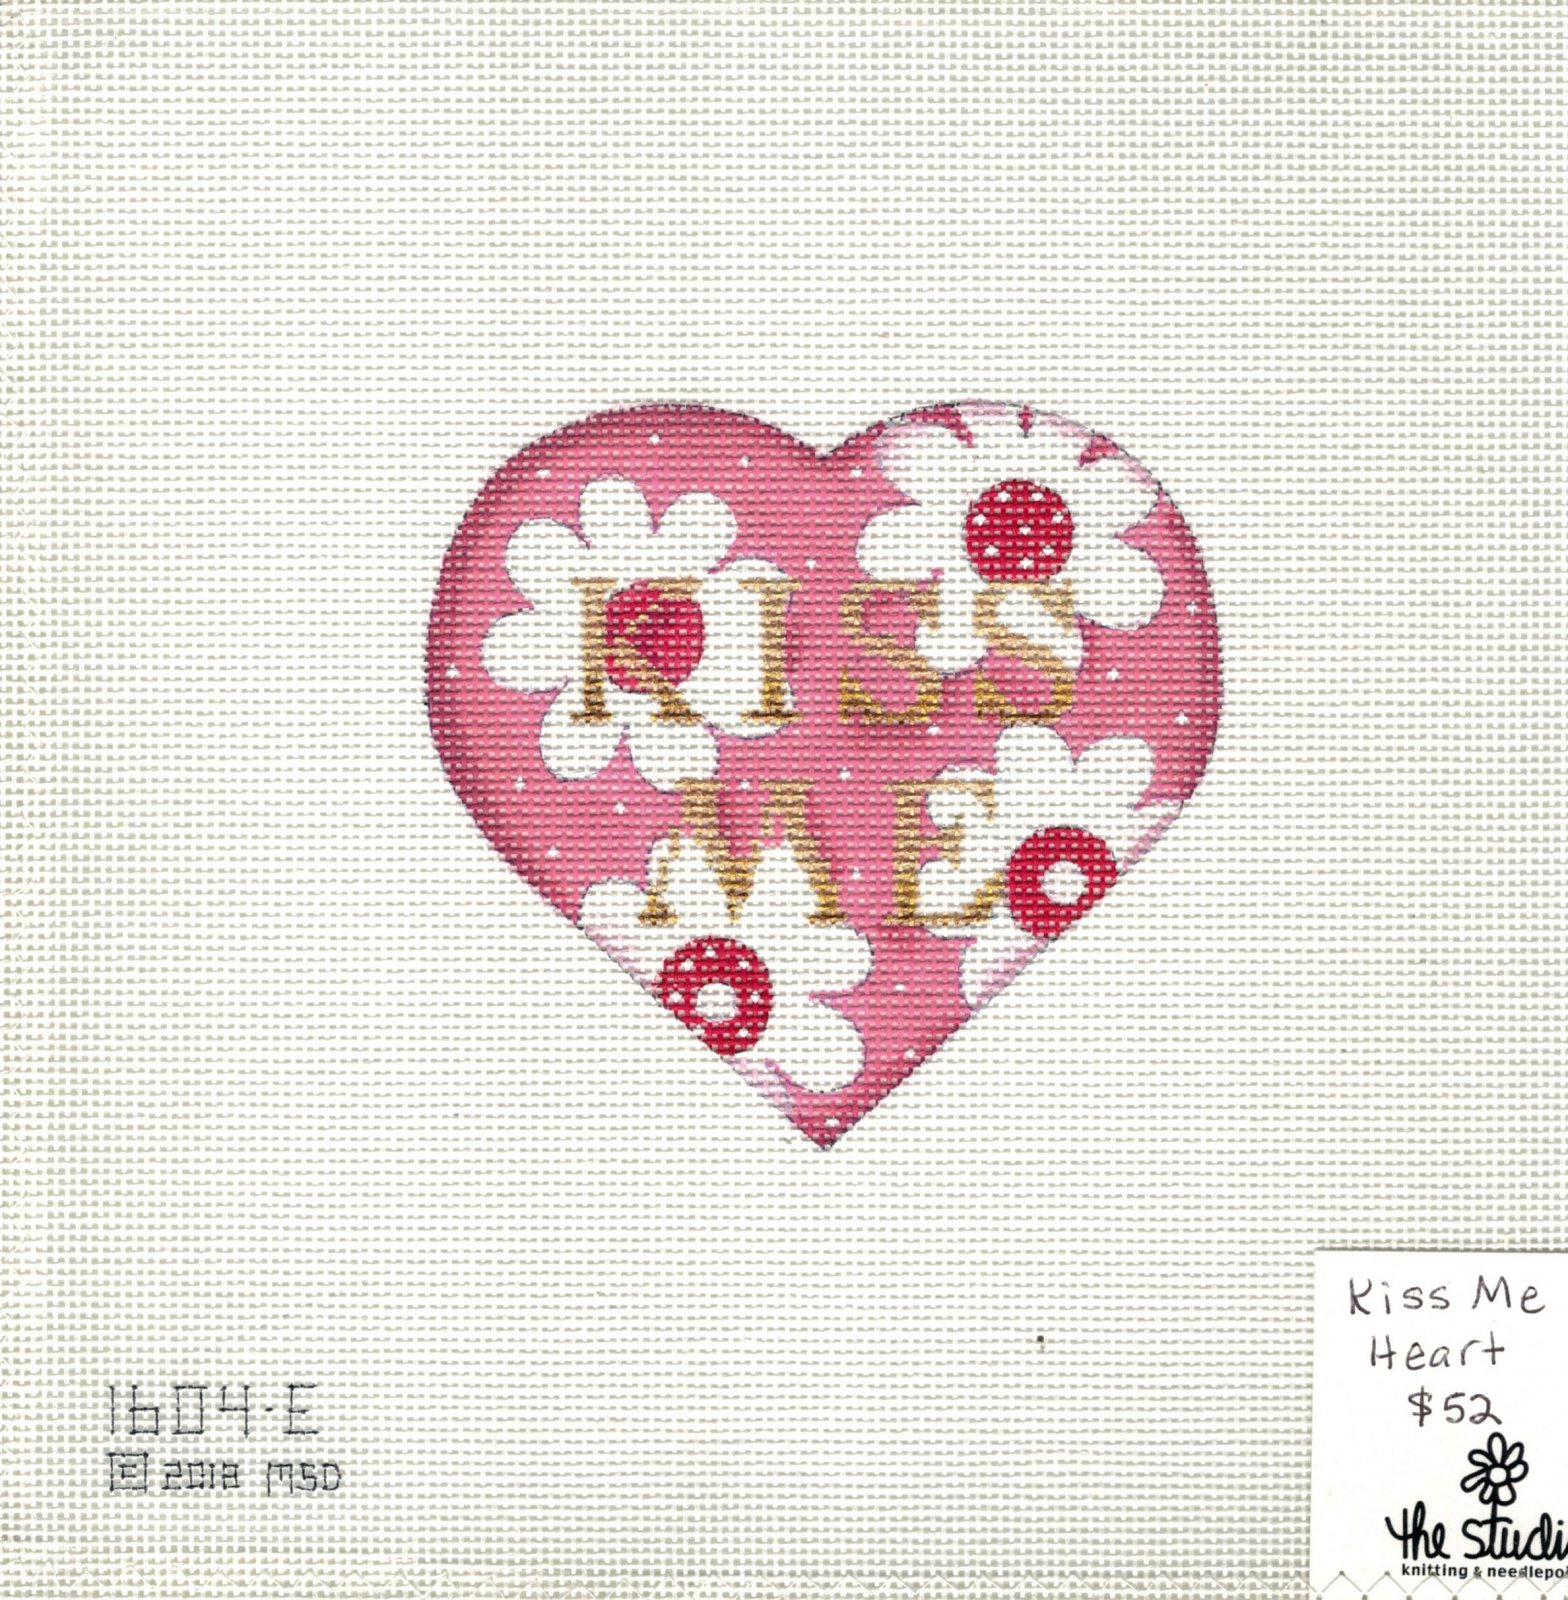 Kiss Me Heart - 18M